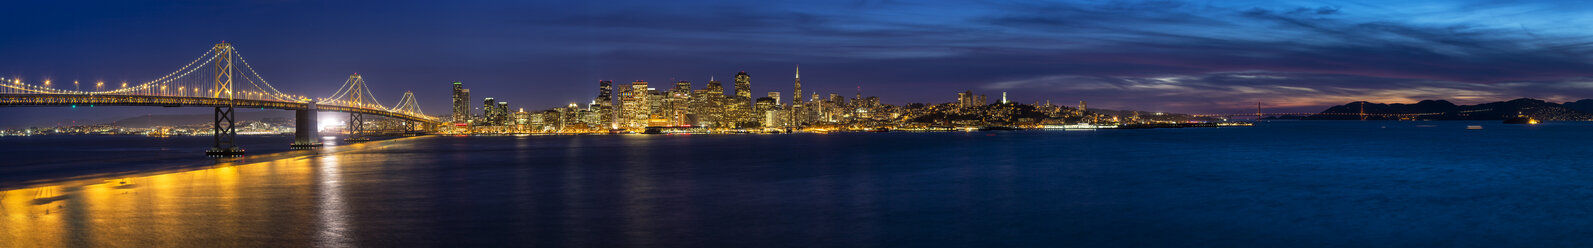 USA, California, San Francisco, Skyline and Oakland Bay Bridge in the evening - FO007055